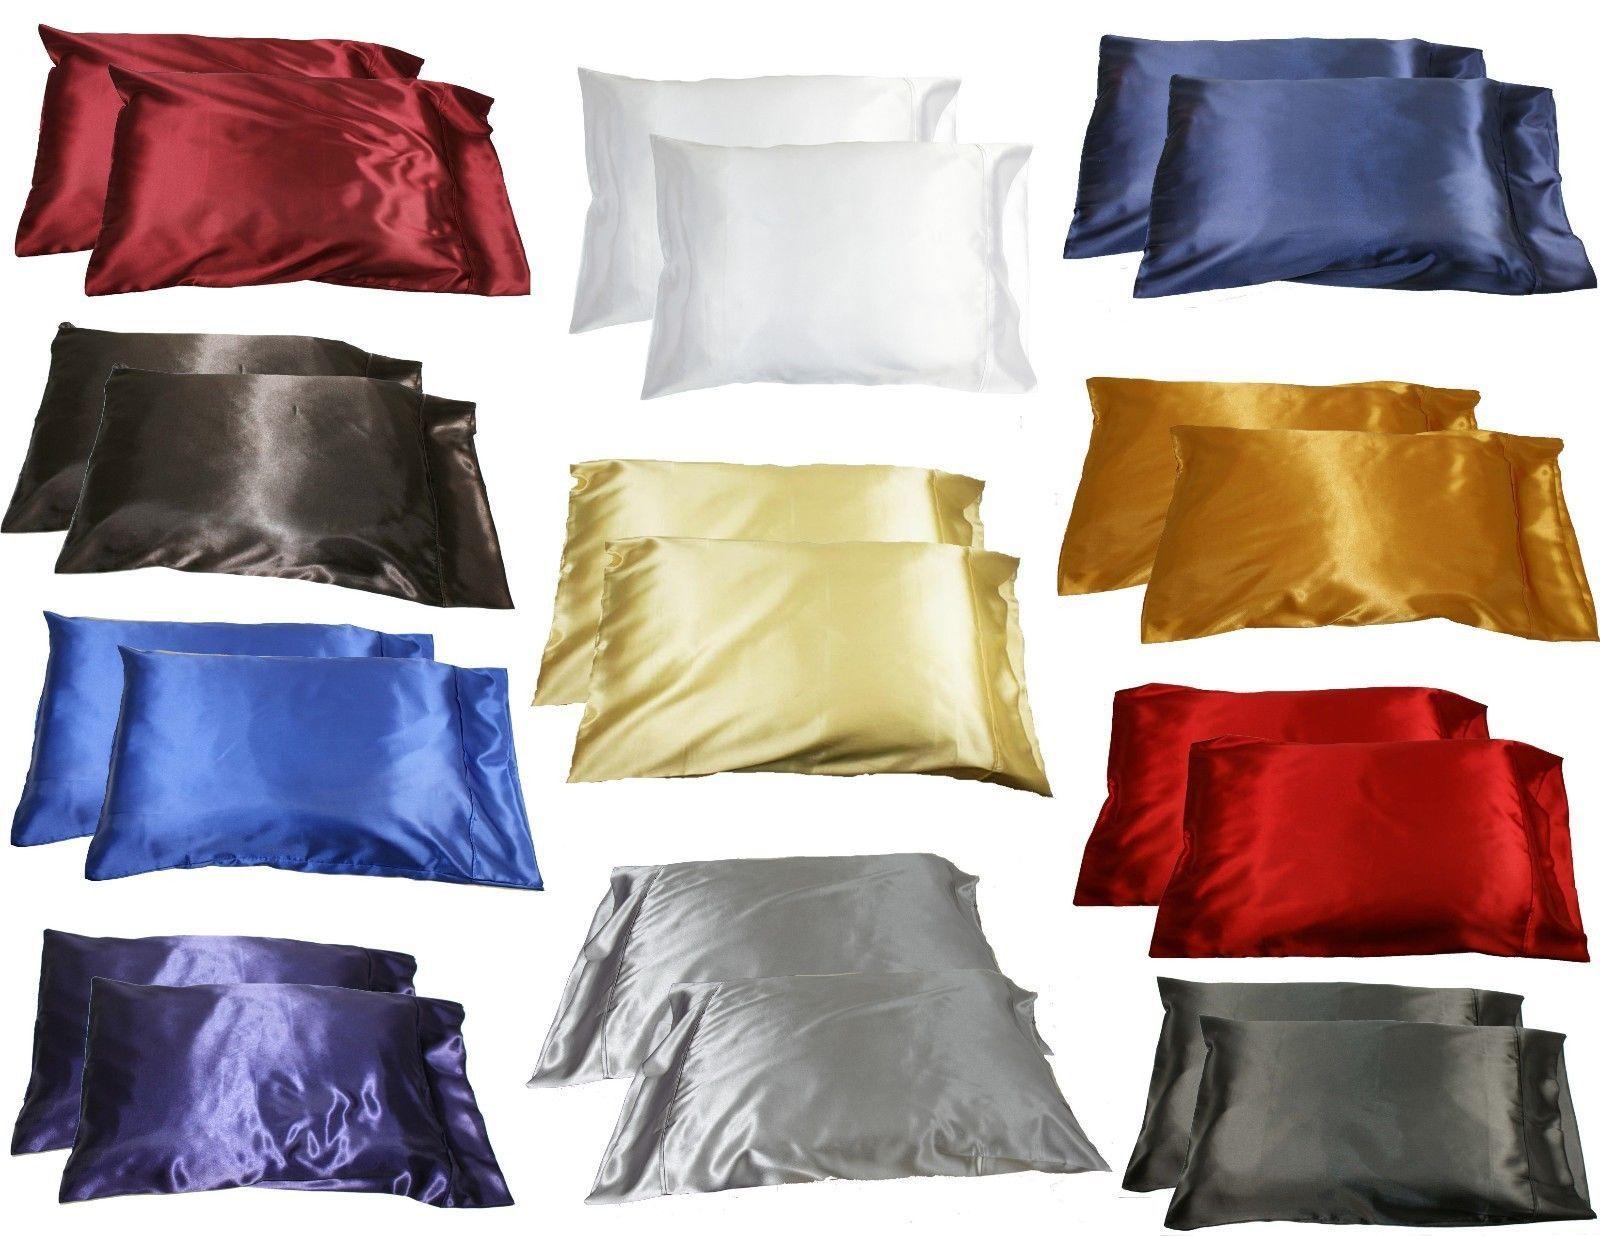 achetez en gros satin taie d 39 oreiller en ligne des grossistes satin taie d 39 oreiller chinois. Black Bedroom Furniture Sets. Home Design Ideas